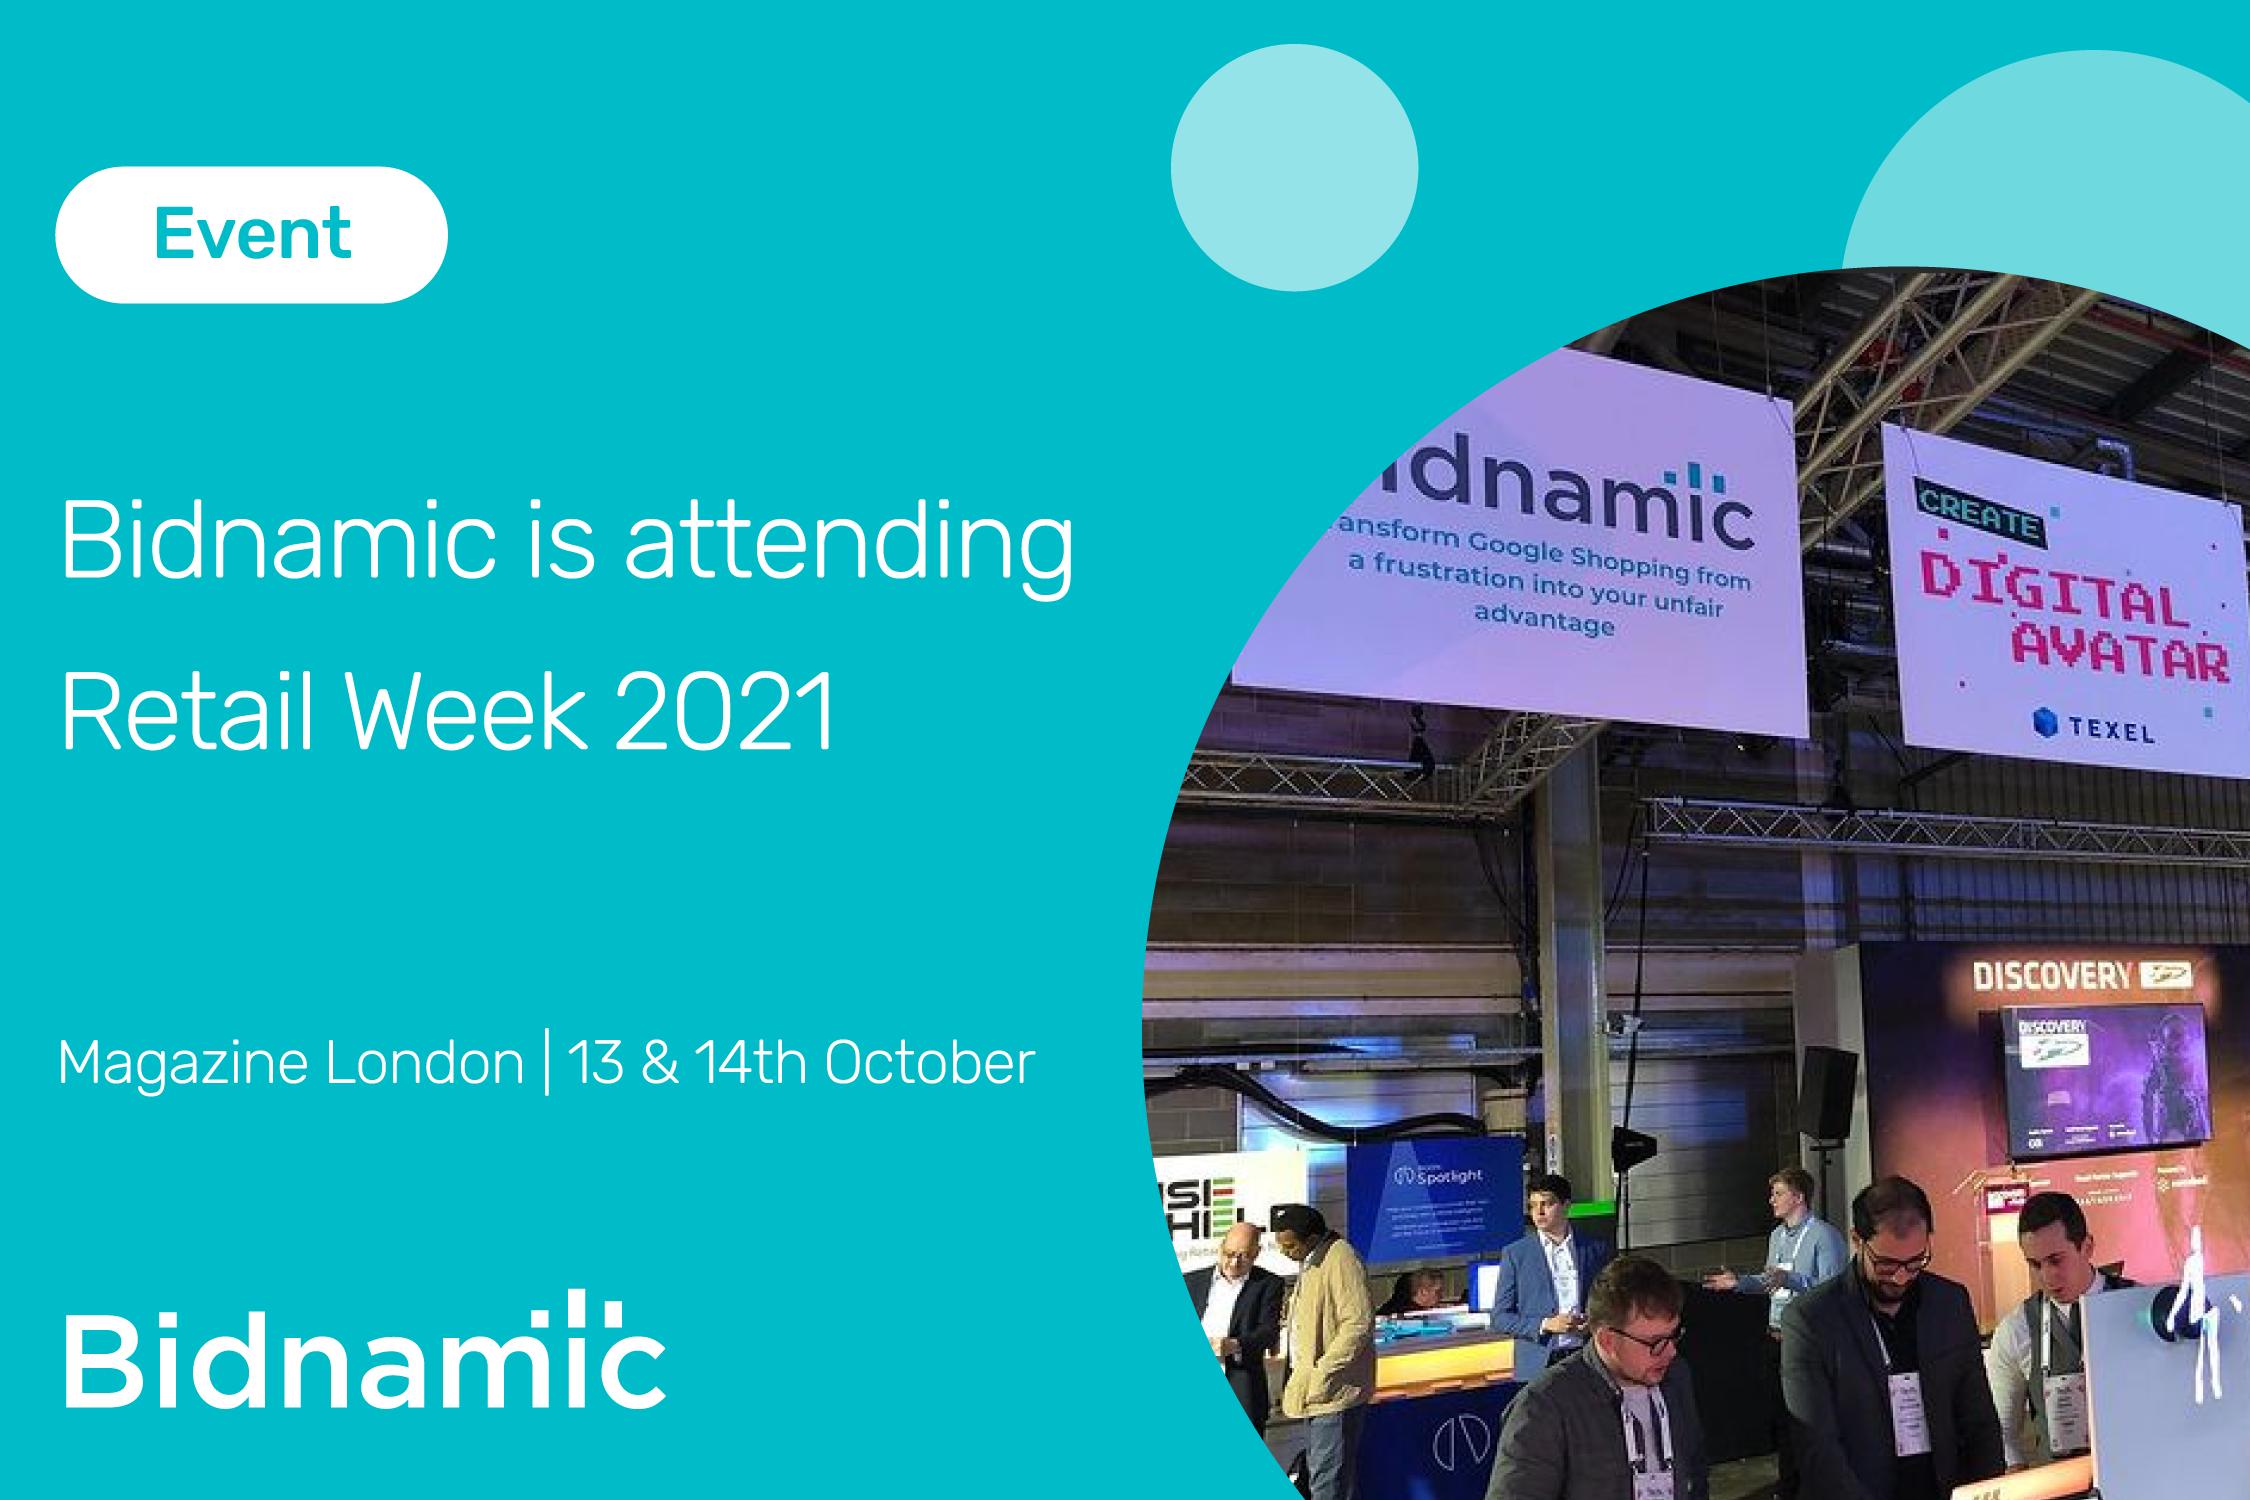 Events: Bidnamic is attending Retail Week 2021!